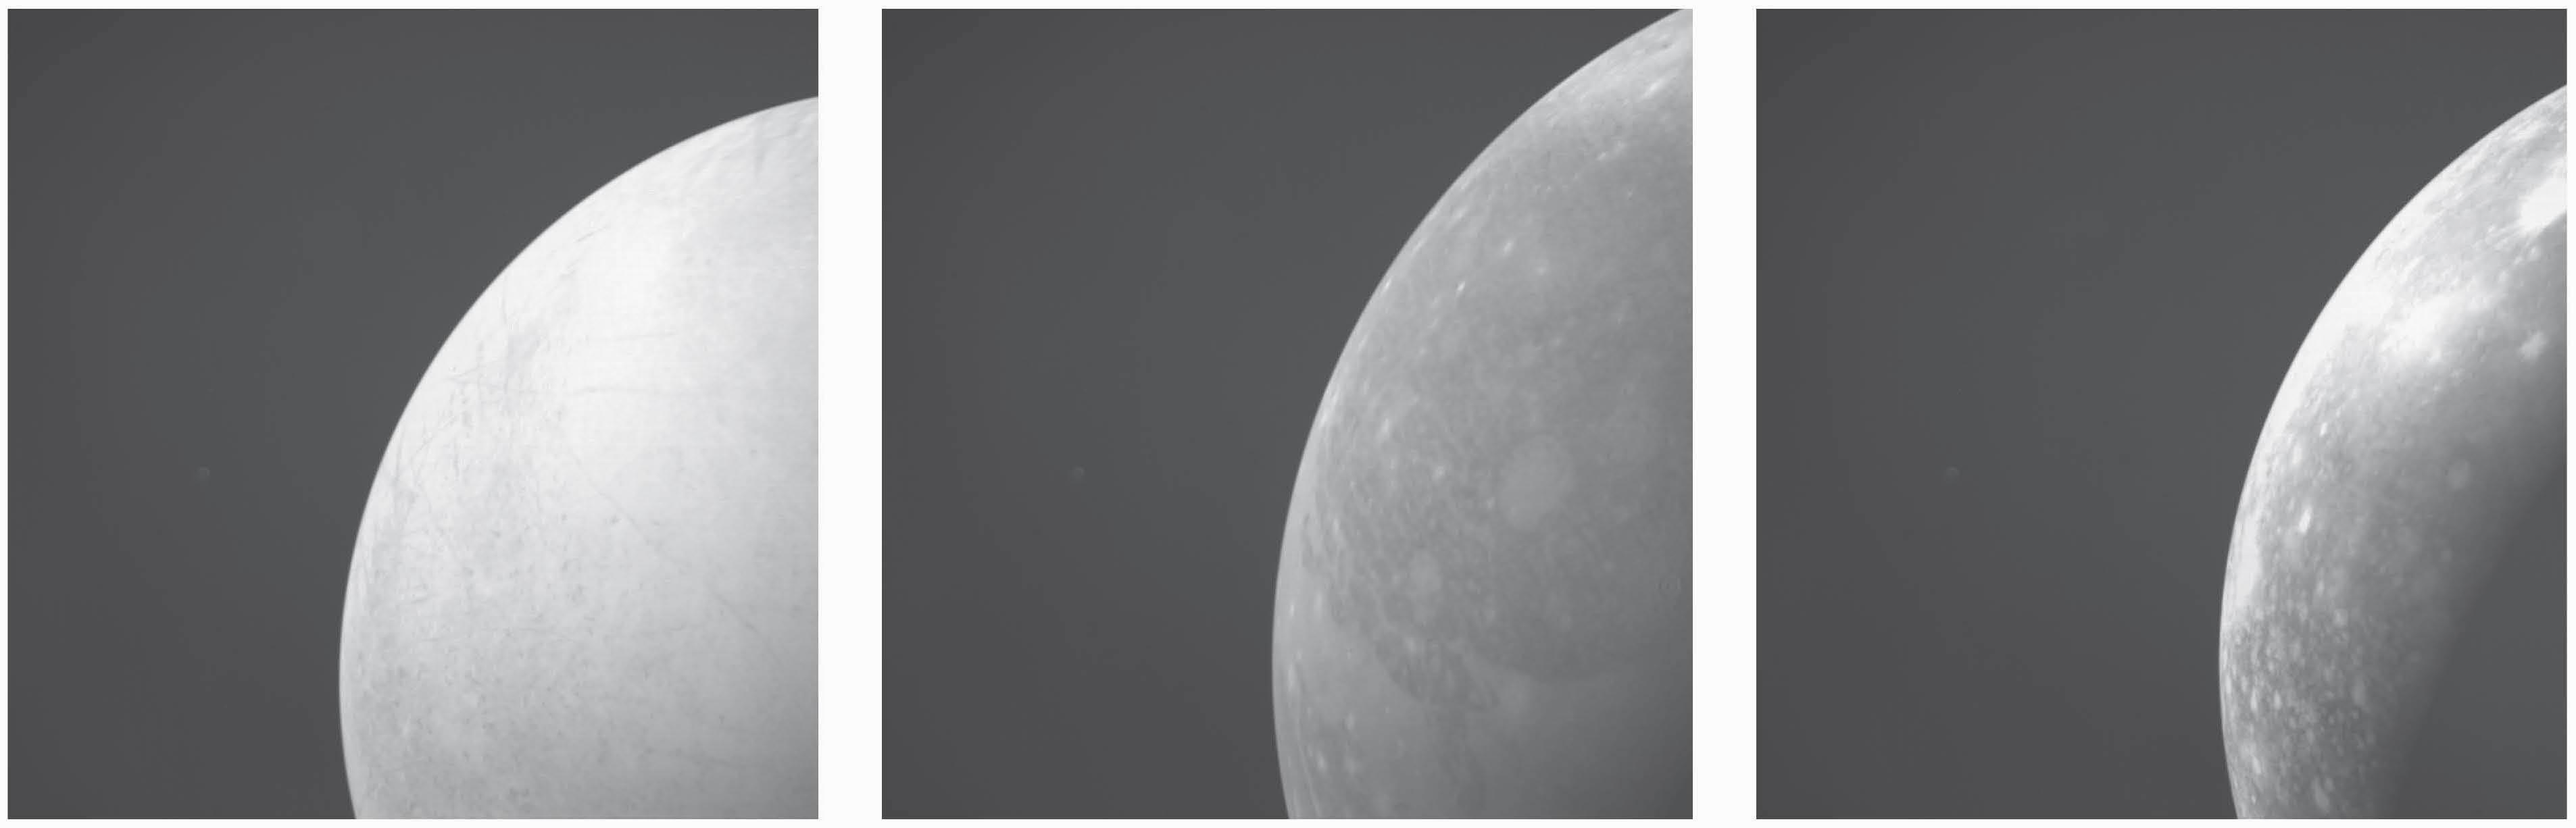 1567214168843-JUICE_NavCam_simulated_view_Europa_Ganymede_Callisto.jpg